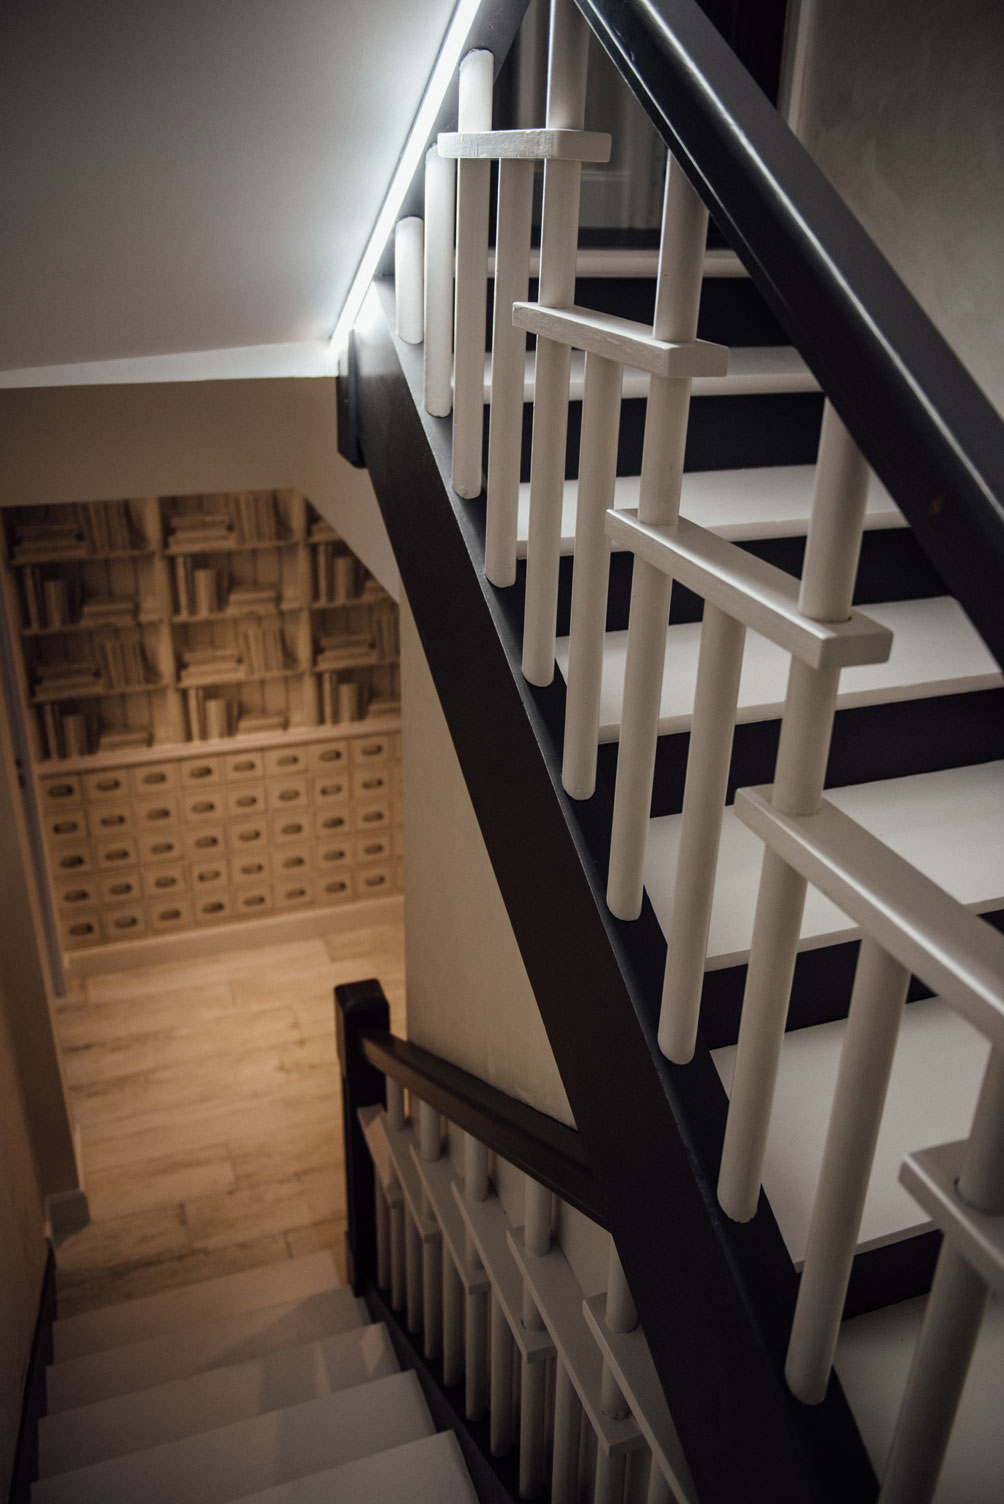 Escaliers | Amirauté Hôtel La Baule